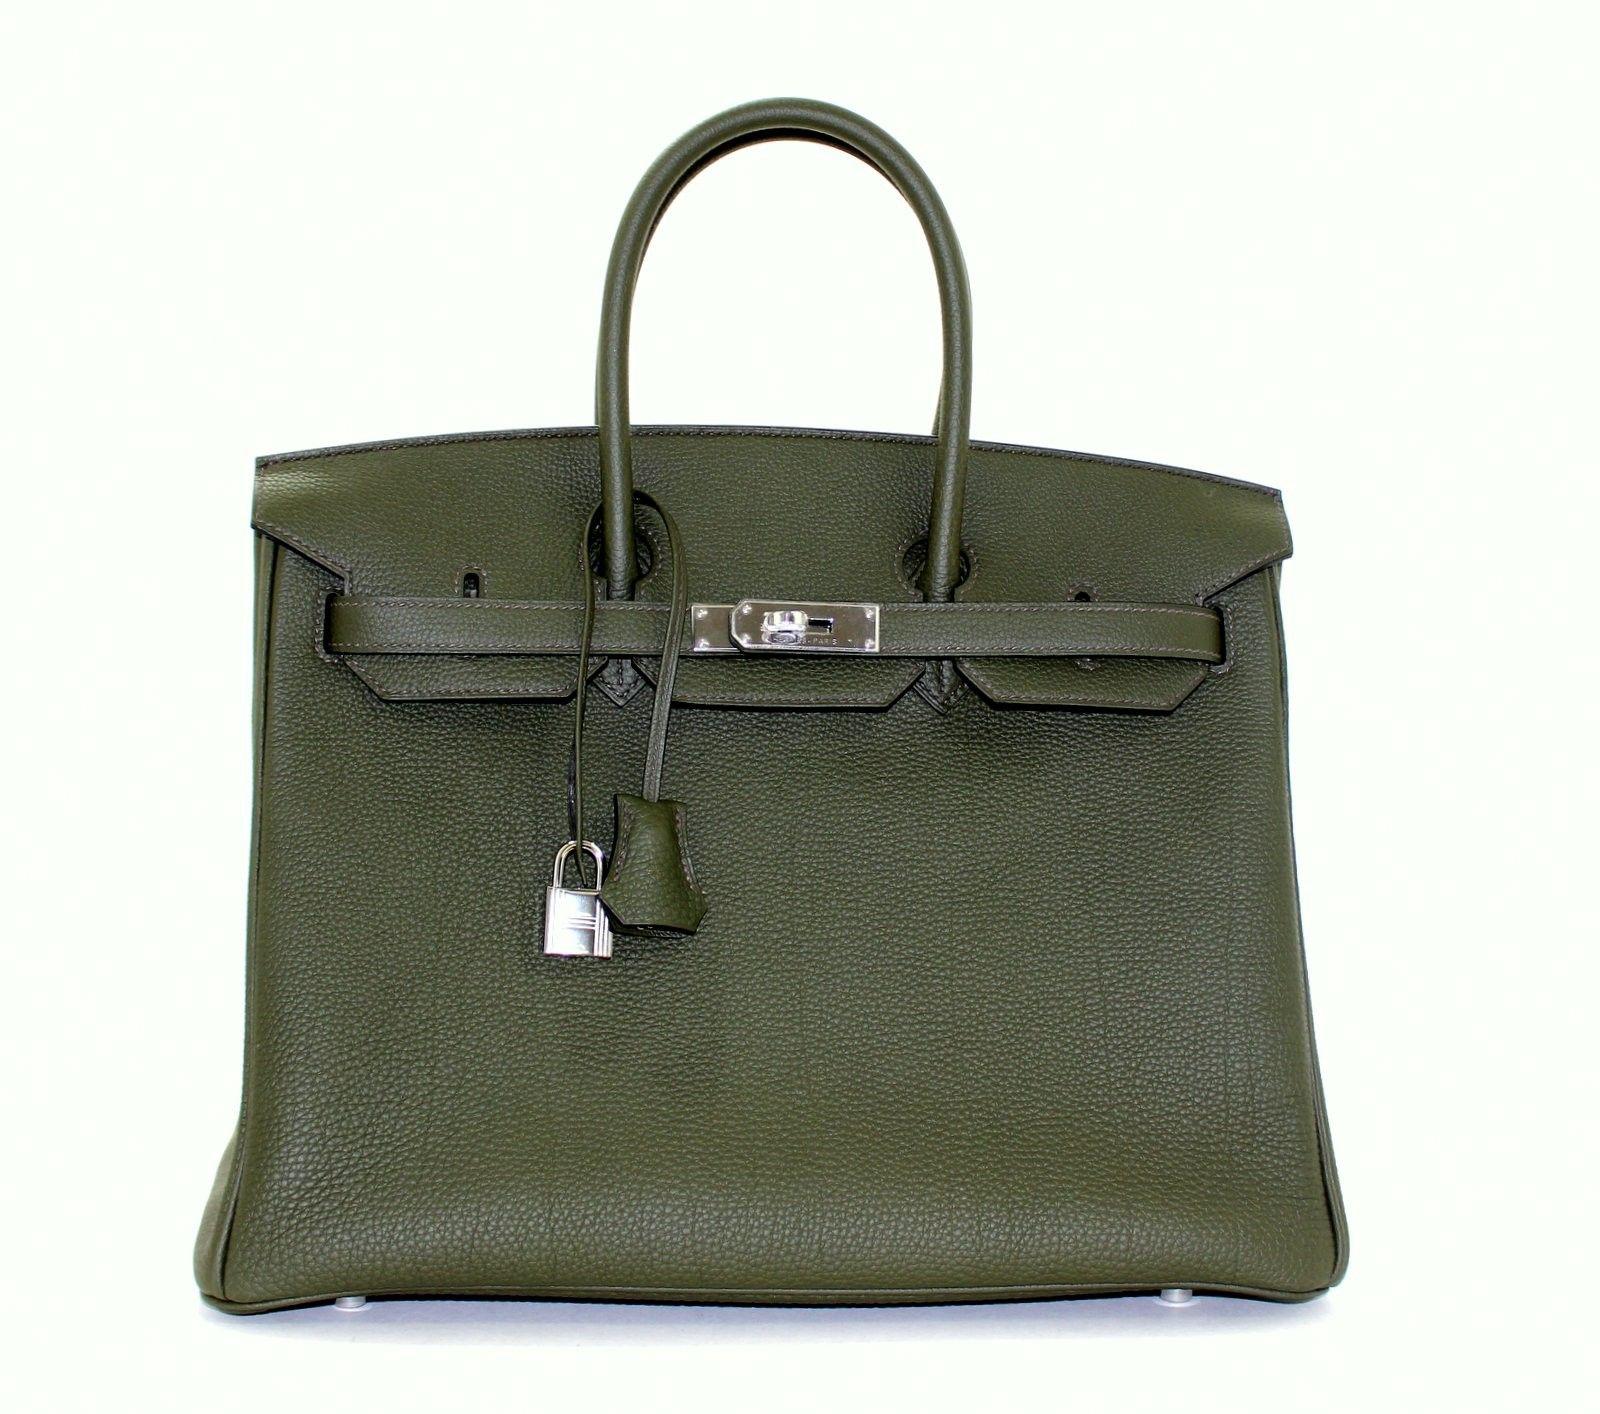 7917d38ef97 Hermès Vert Olive-Green color-Togo 35 cm Birkin with Palladium ...